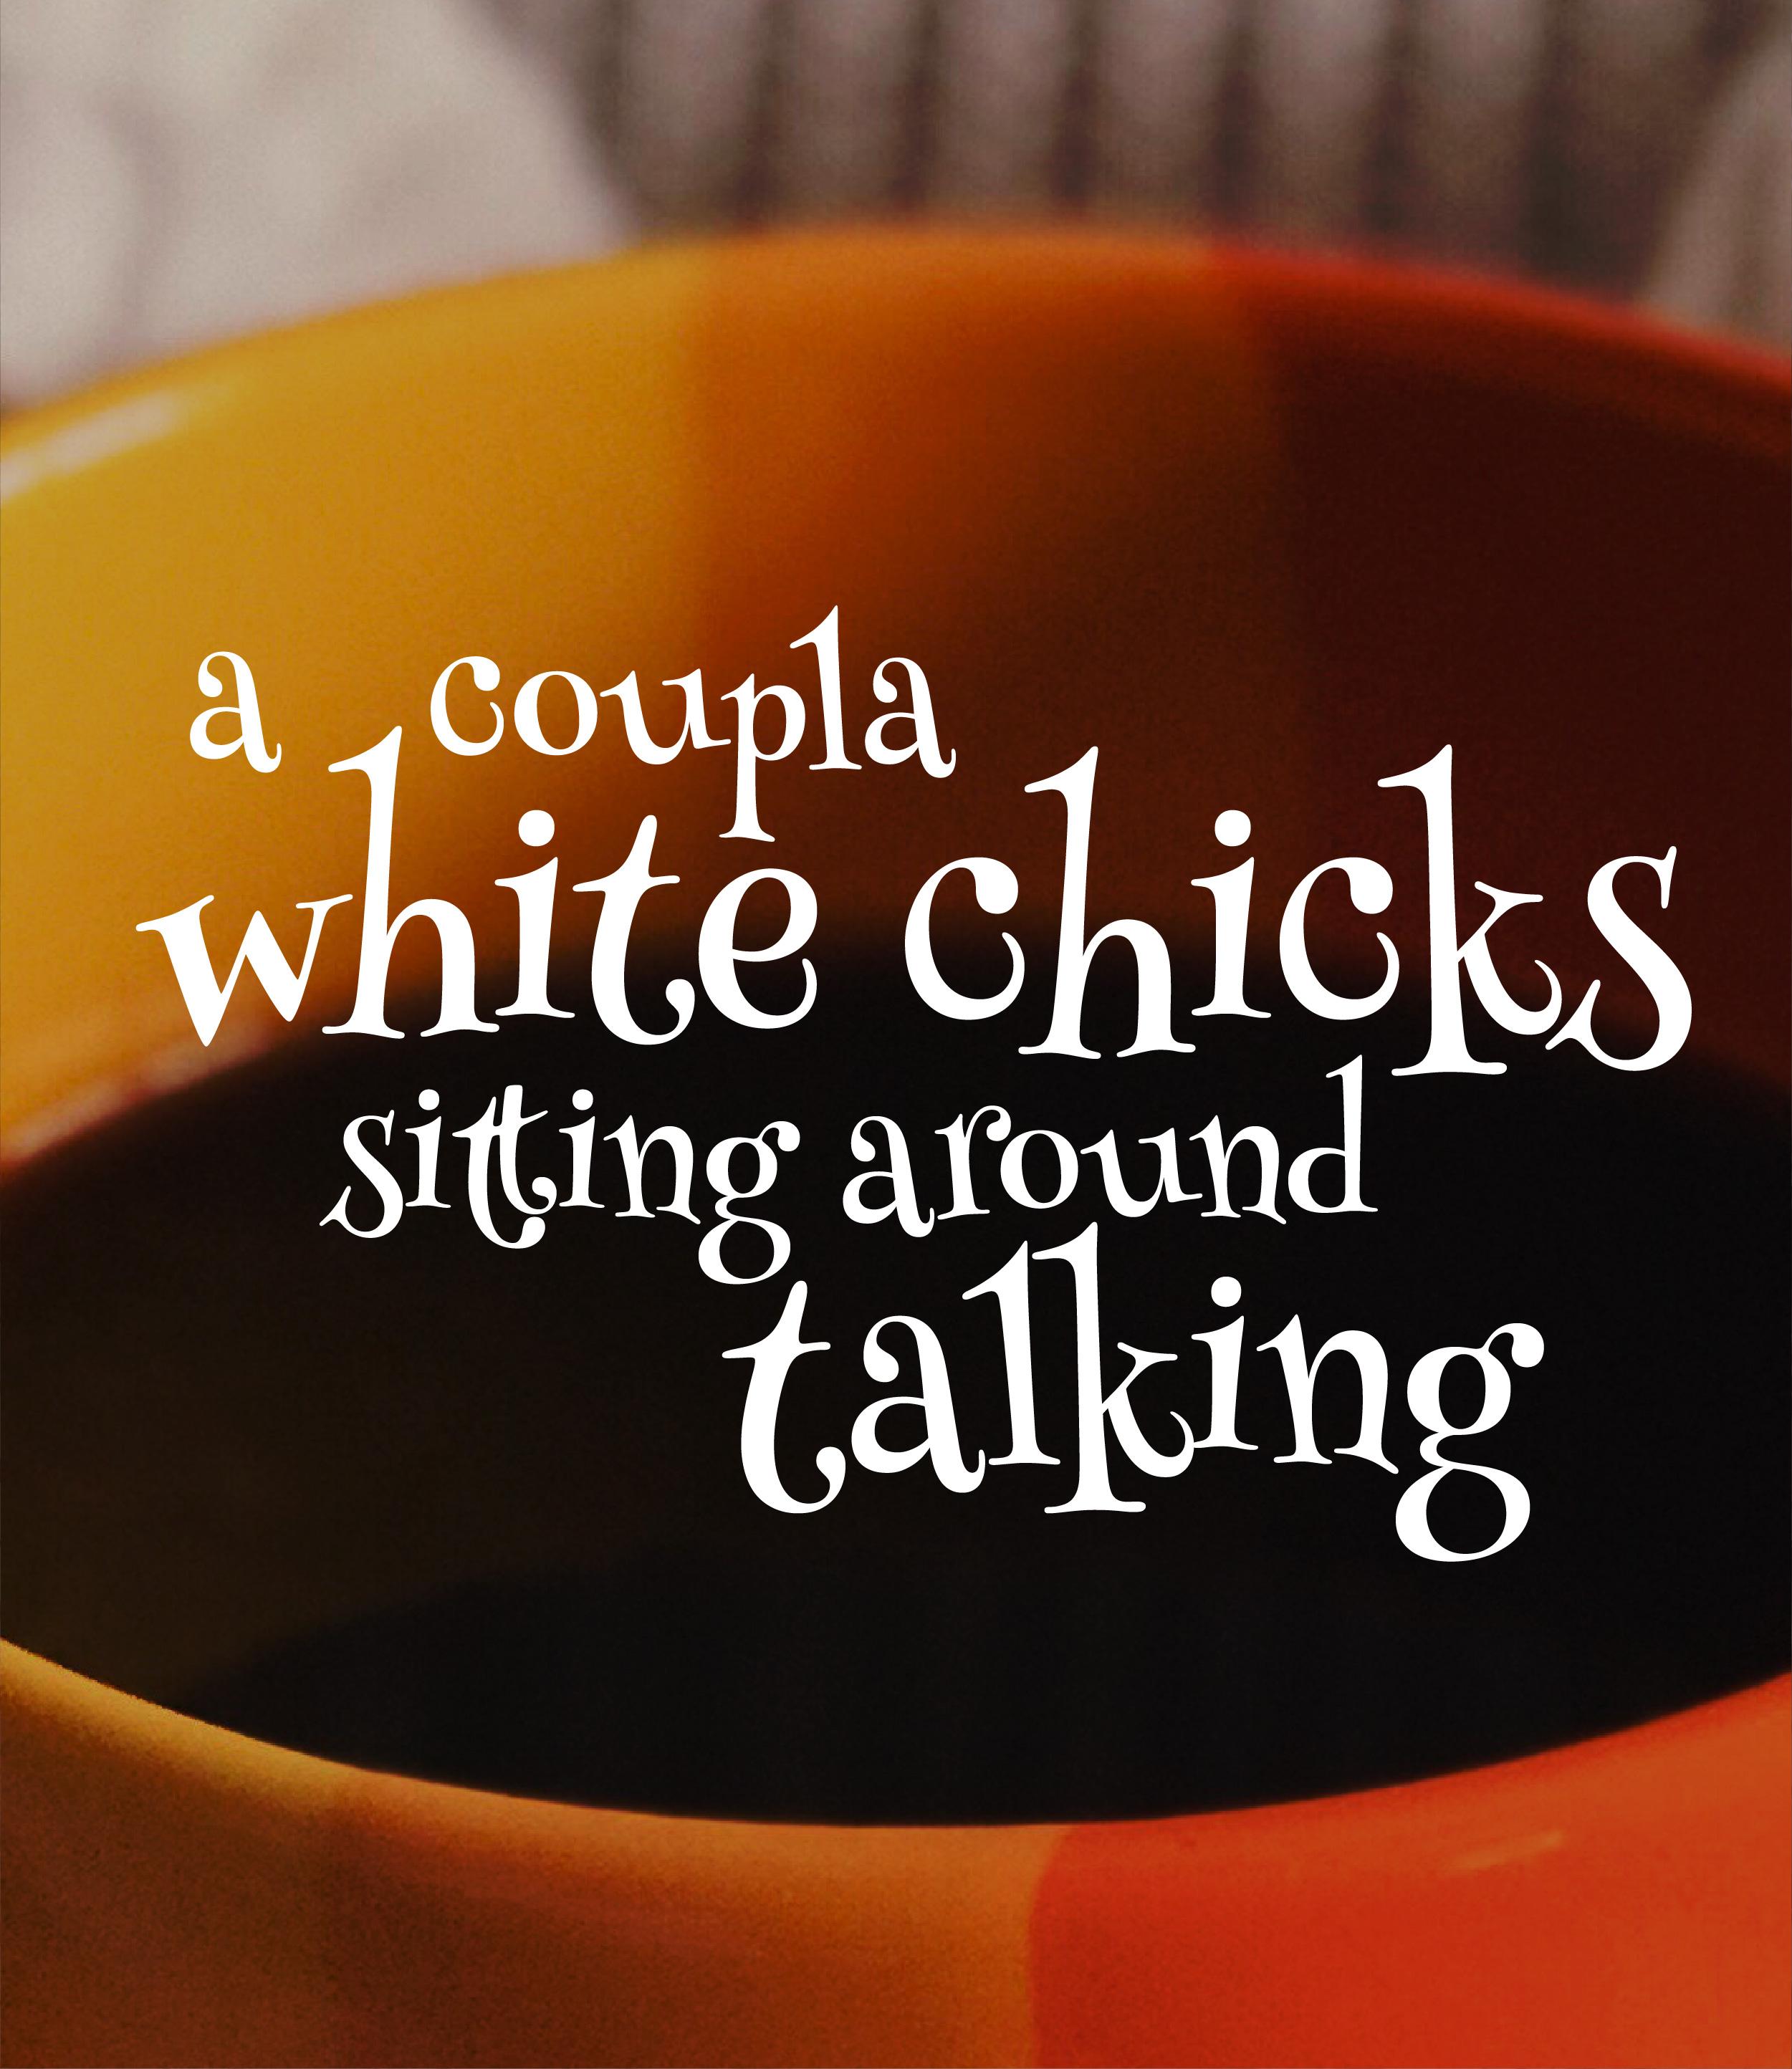 A Coupla White Chicks Sitting Around Talking